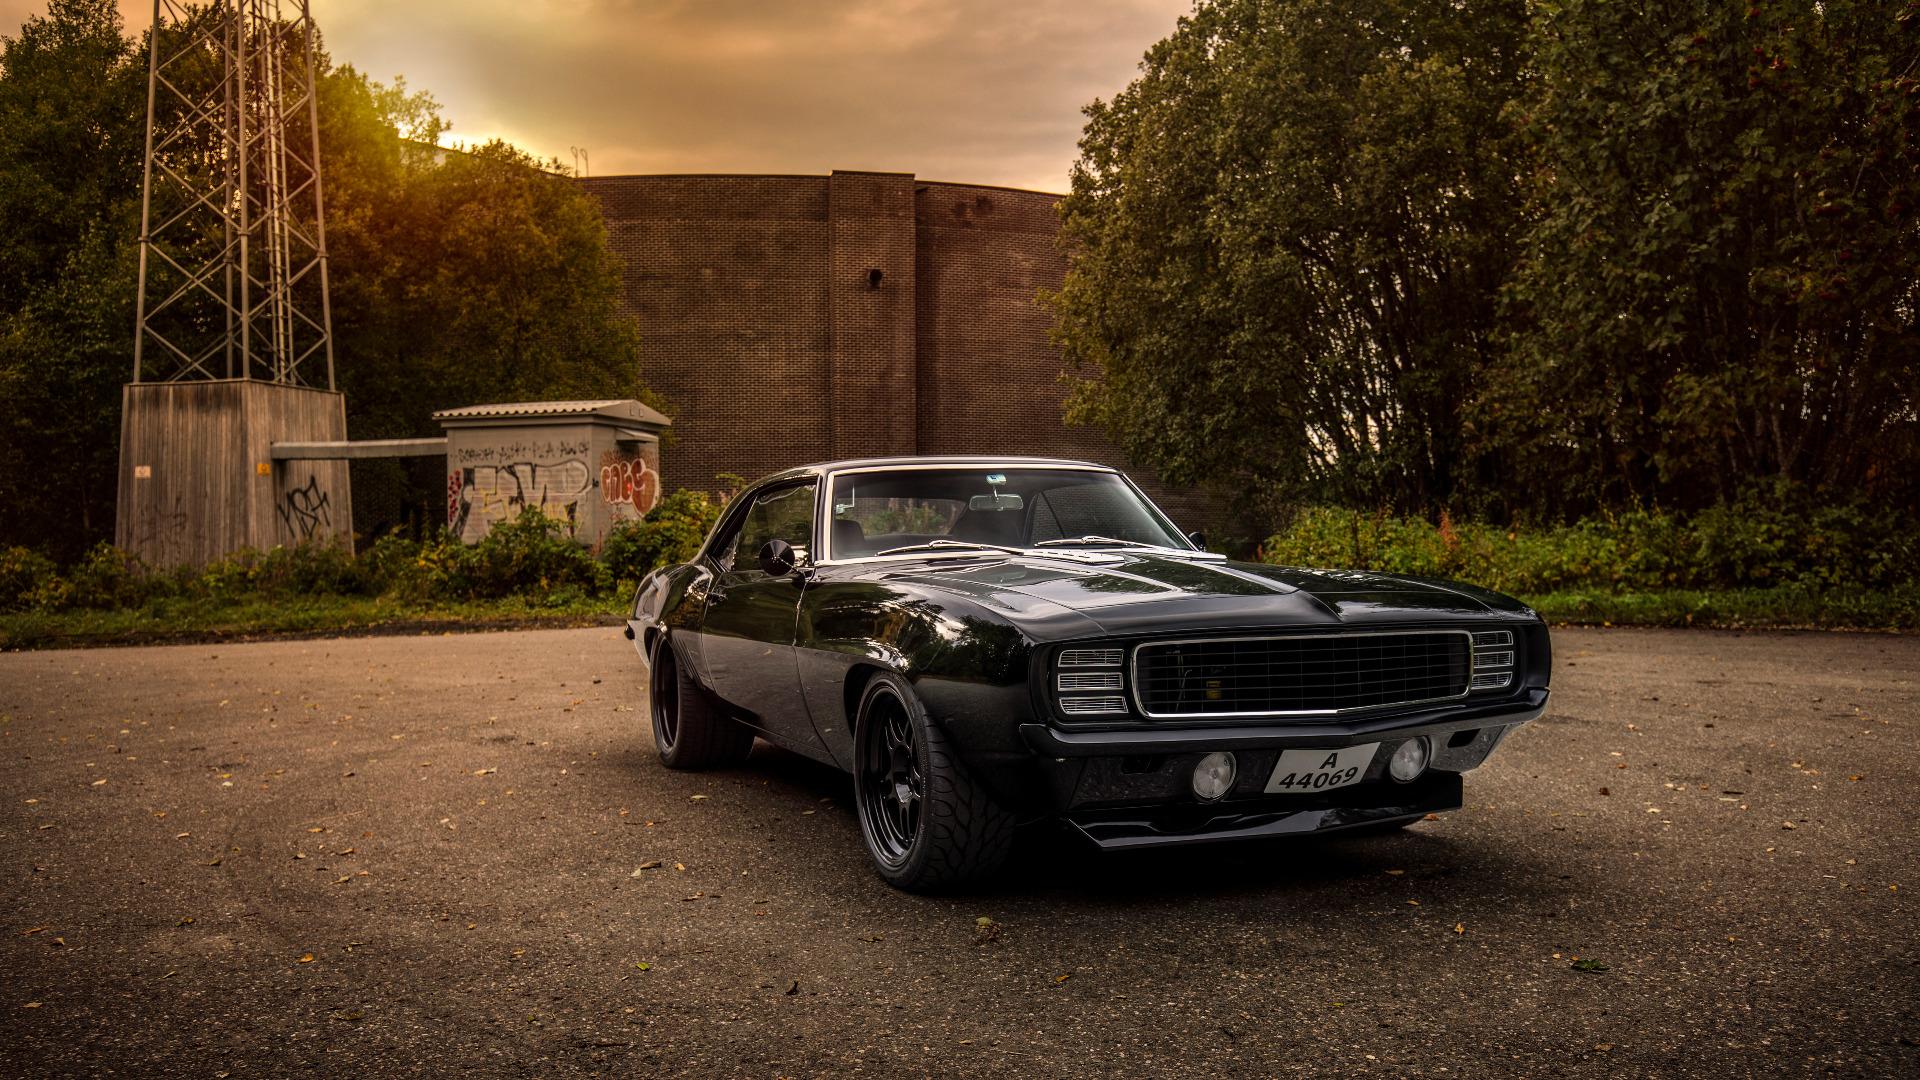 Helvetescamaroen - 1969 Chevrolet Camaro